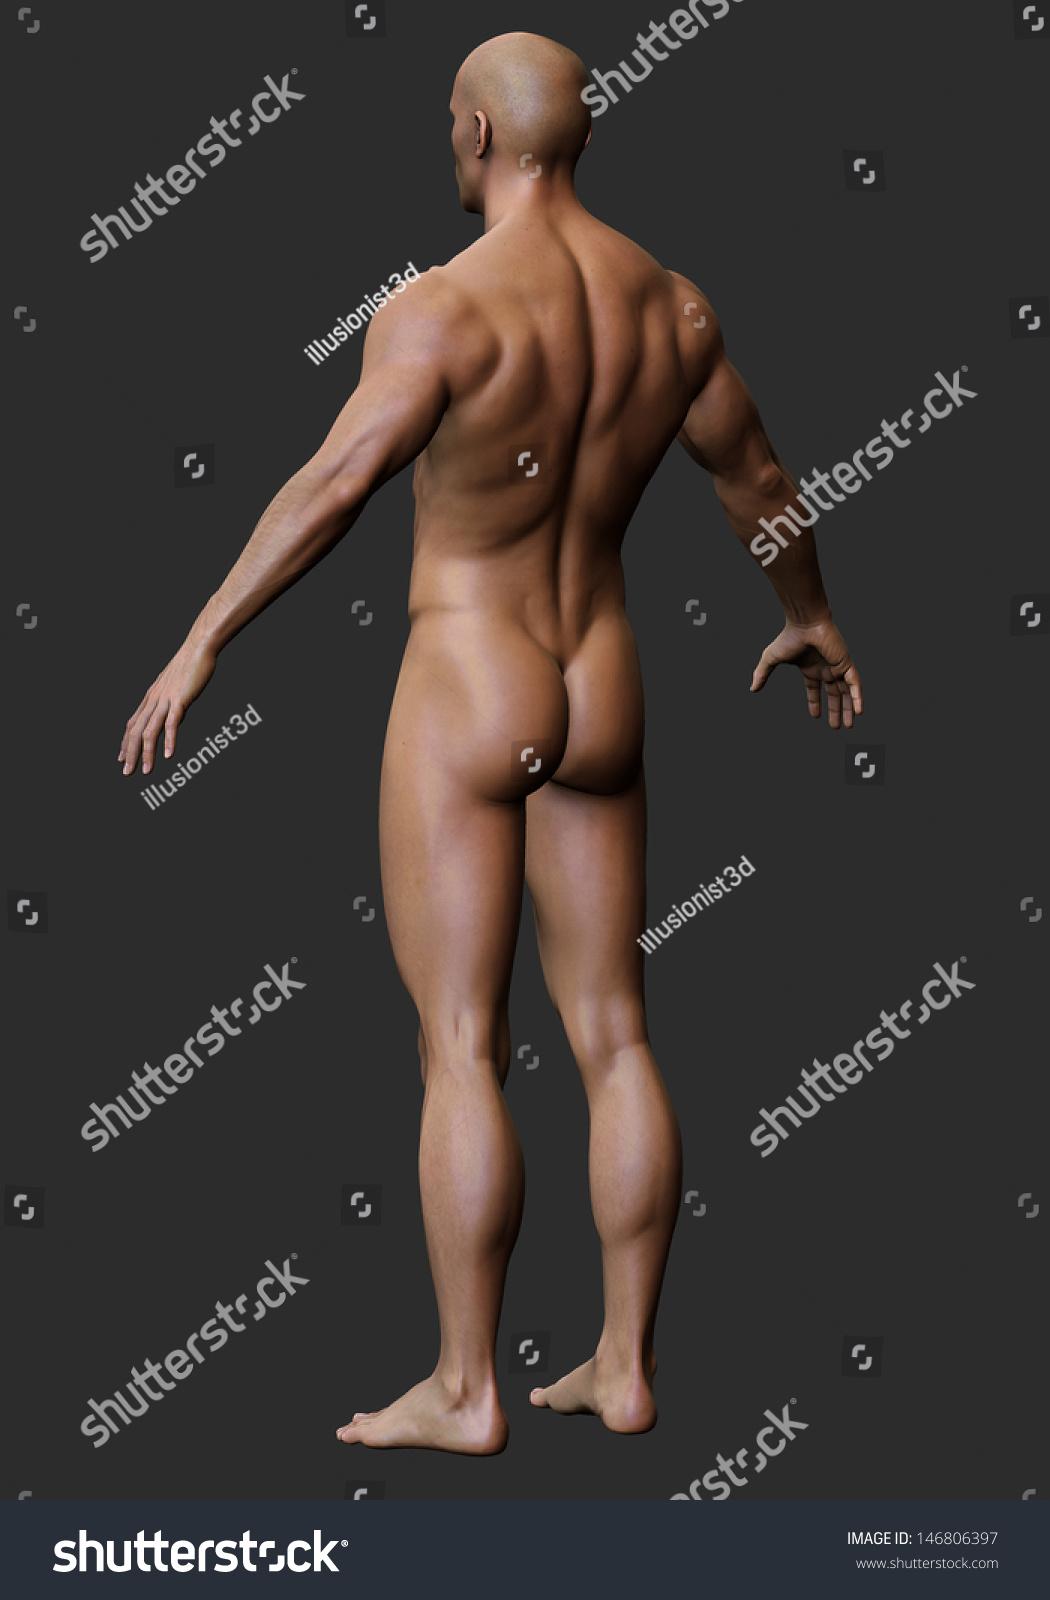 3d male body anatomy naked stock illustration 146806397 - shutterstock